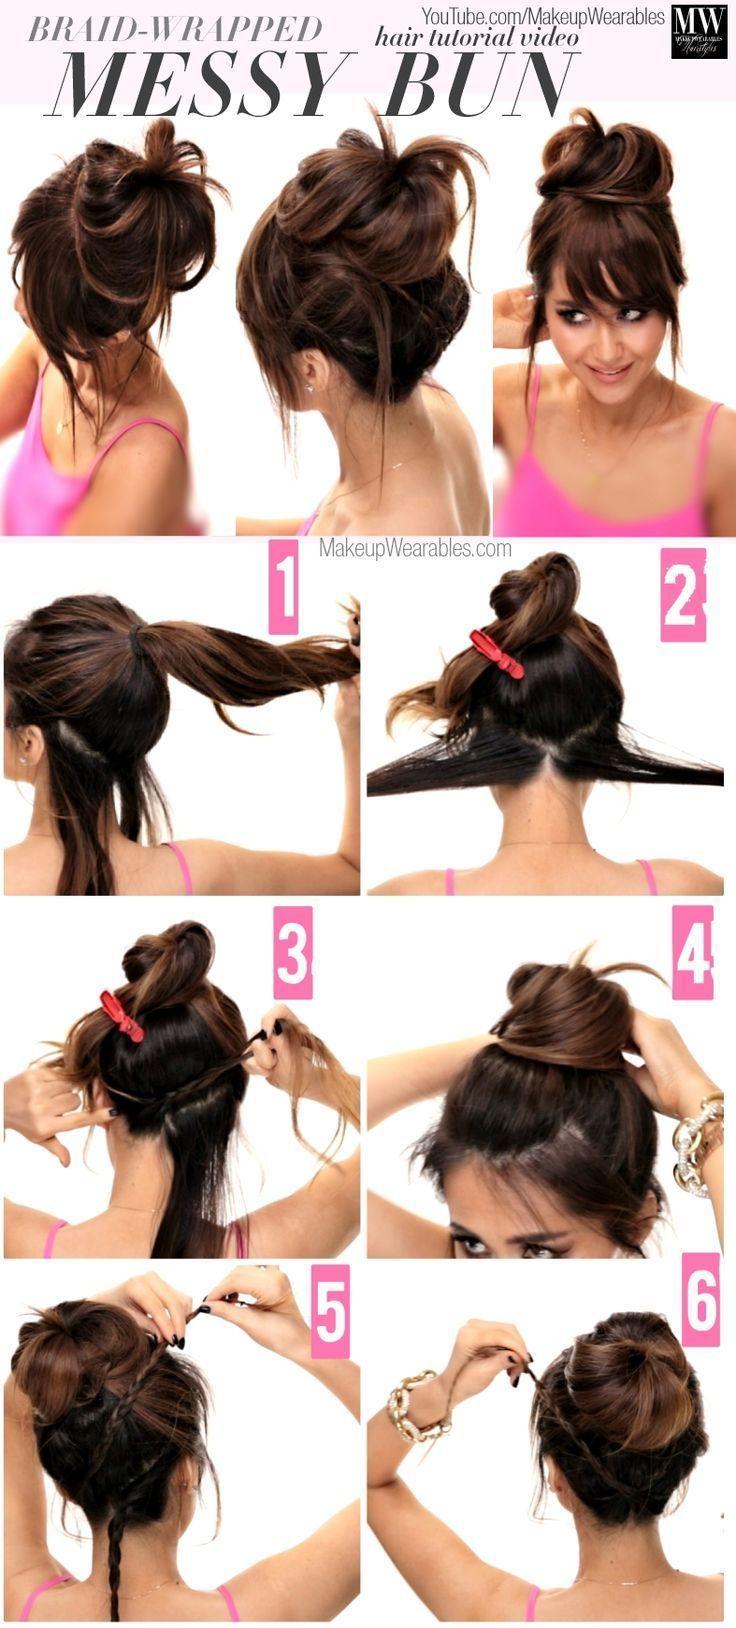 Braid Wrapped Messy Bun Hairstyle  Hair Style  Braiding Guides